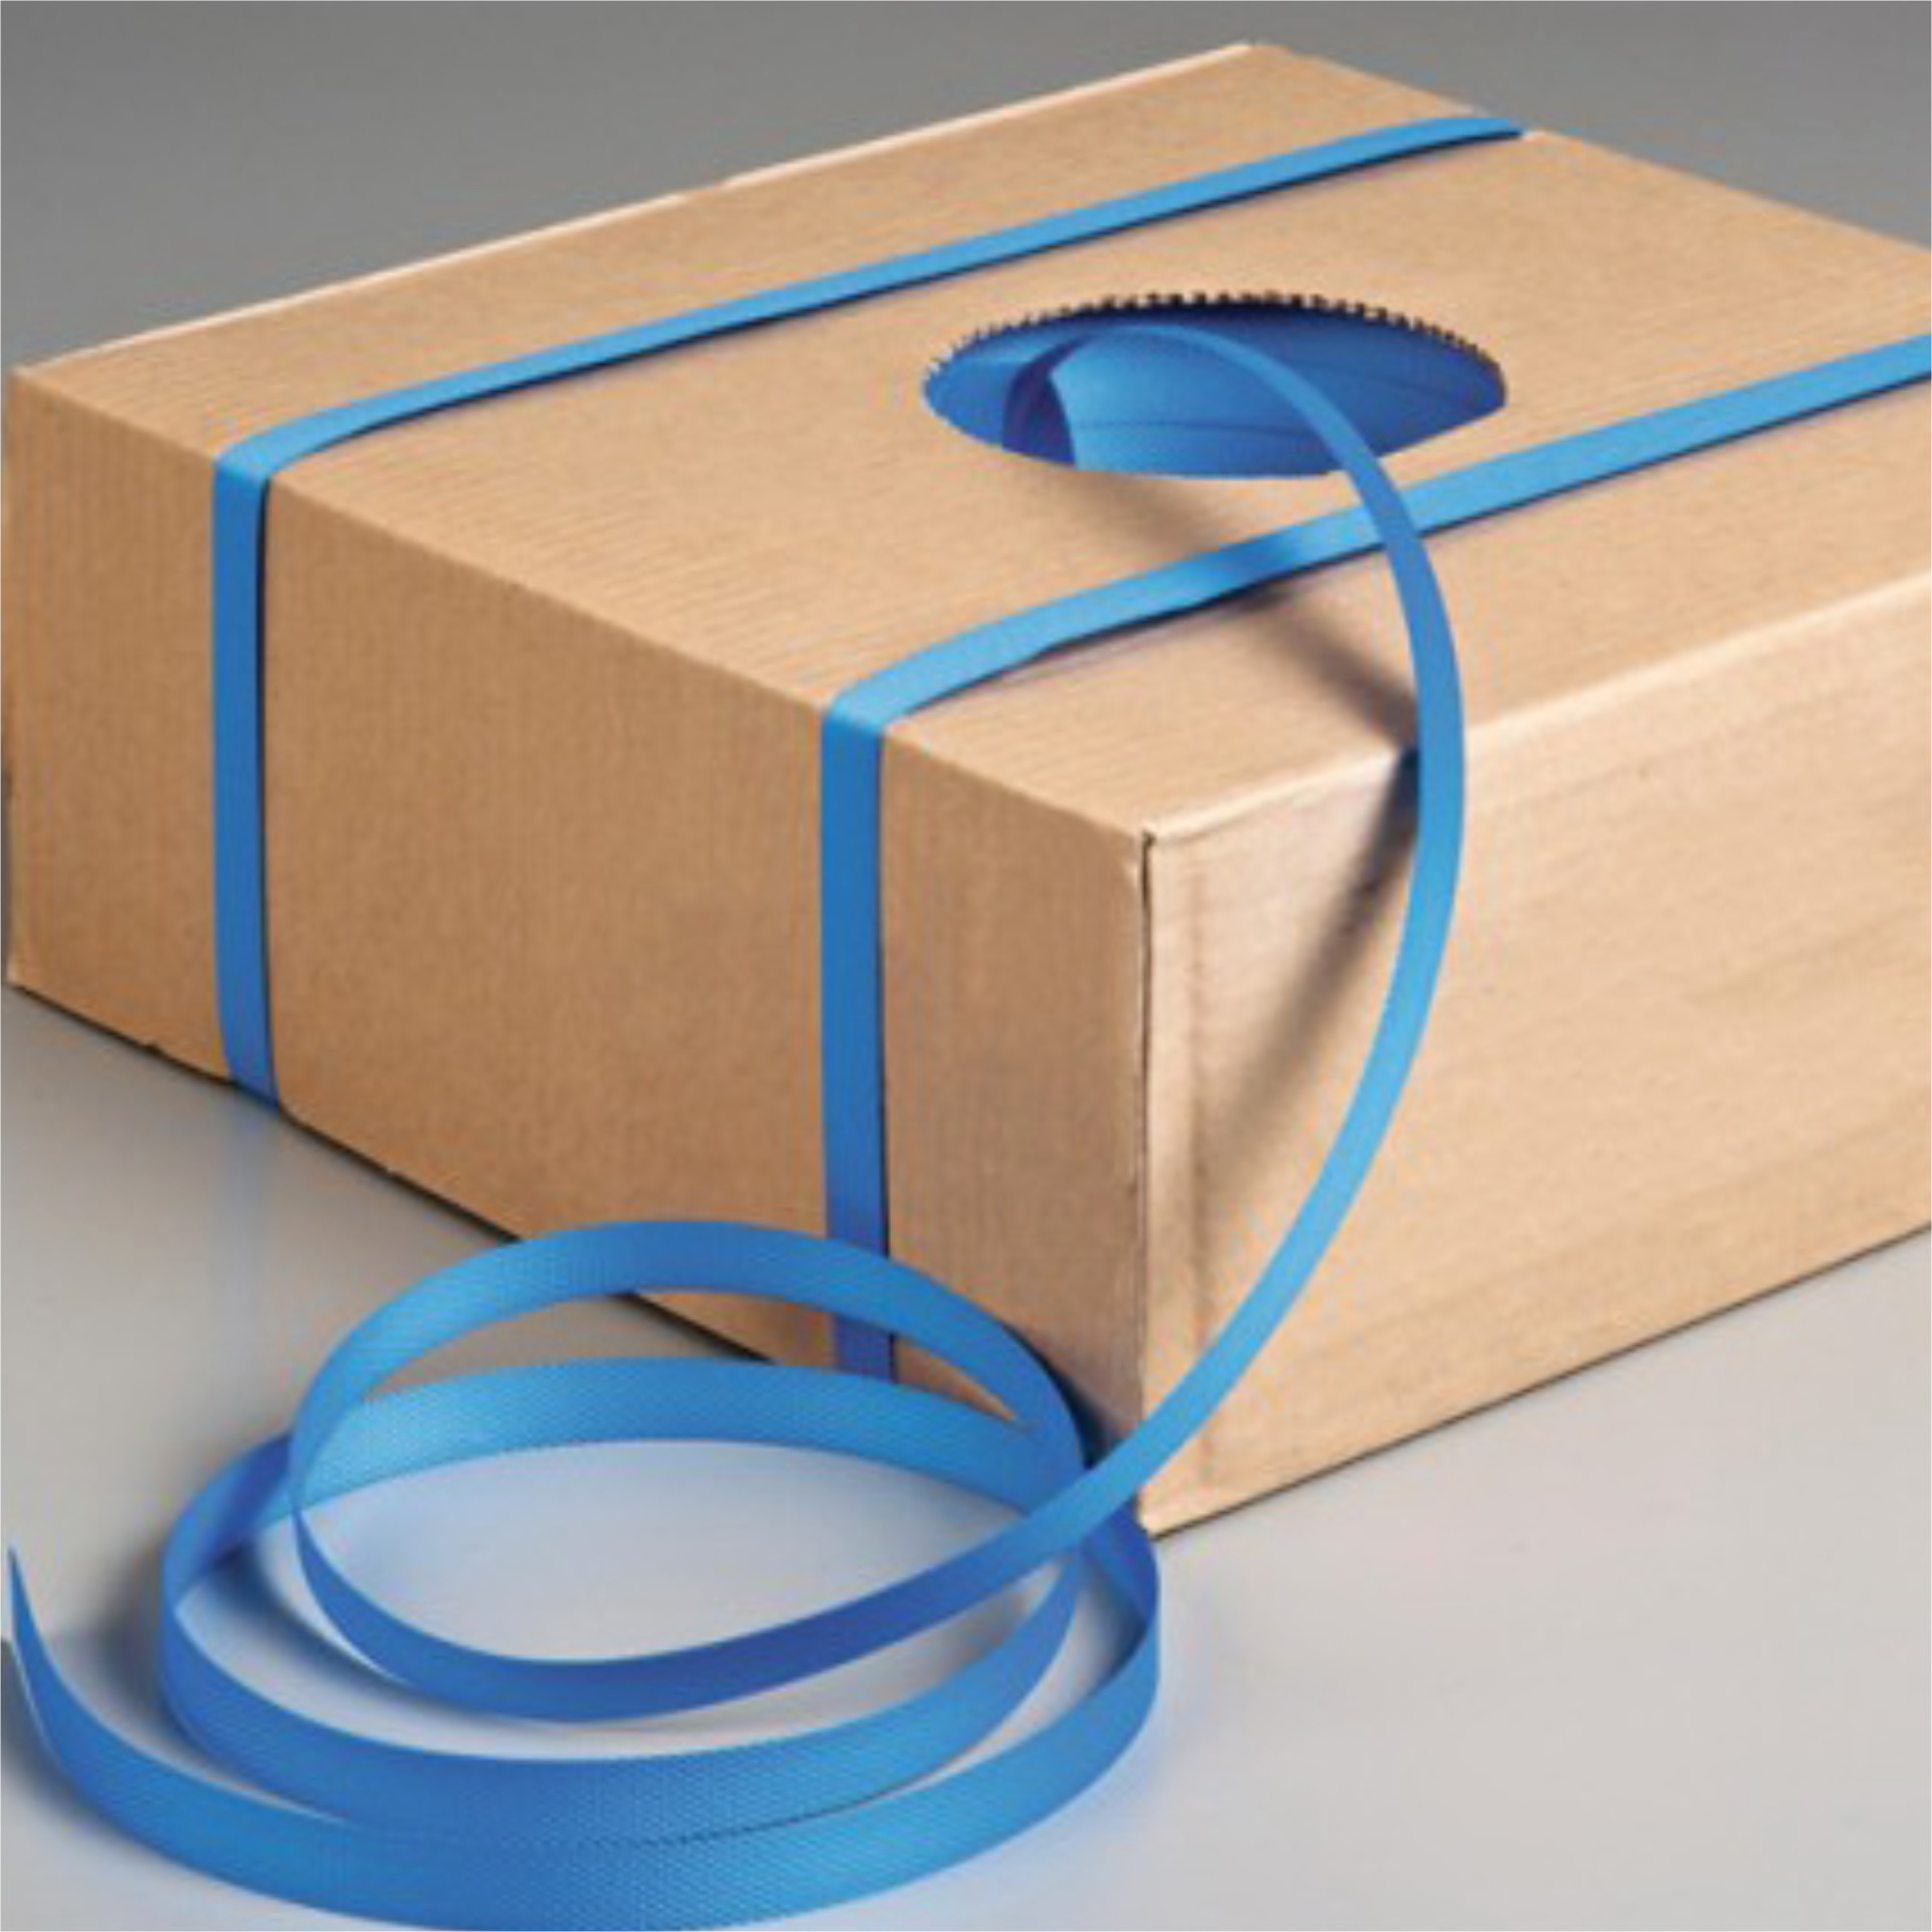 12mm x 1000m Plastic Hand Strap Blue Polypropylene Strapping